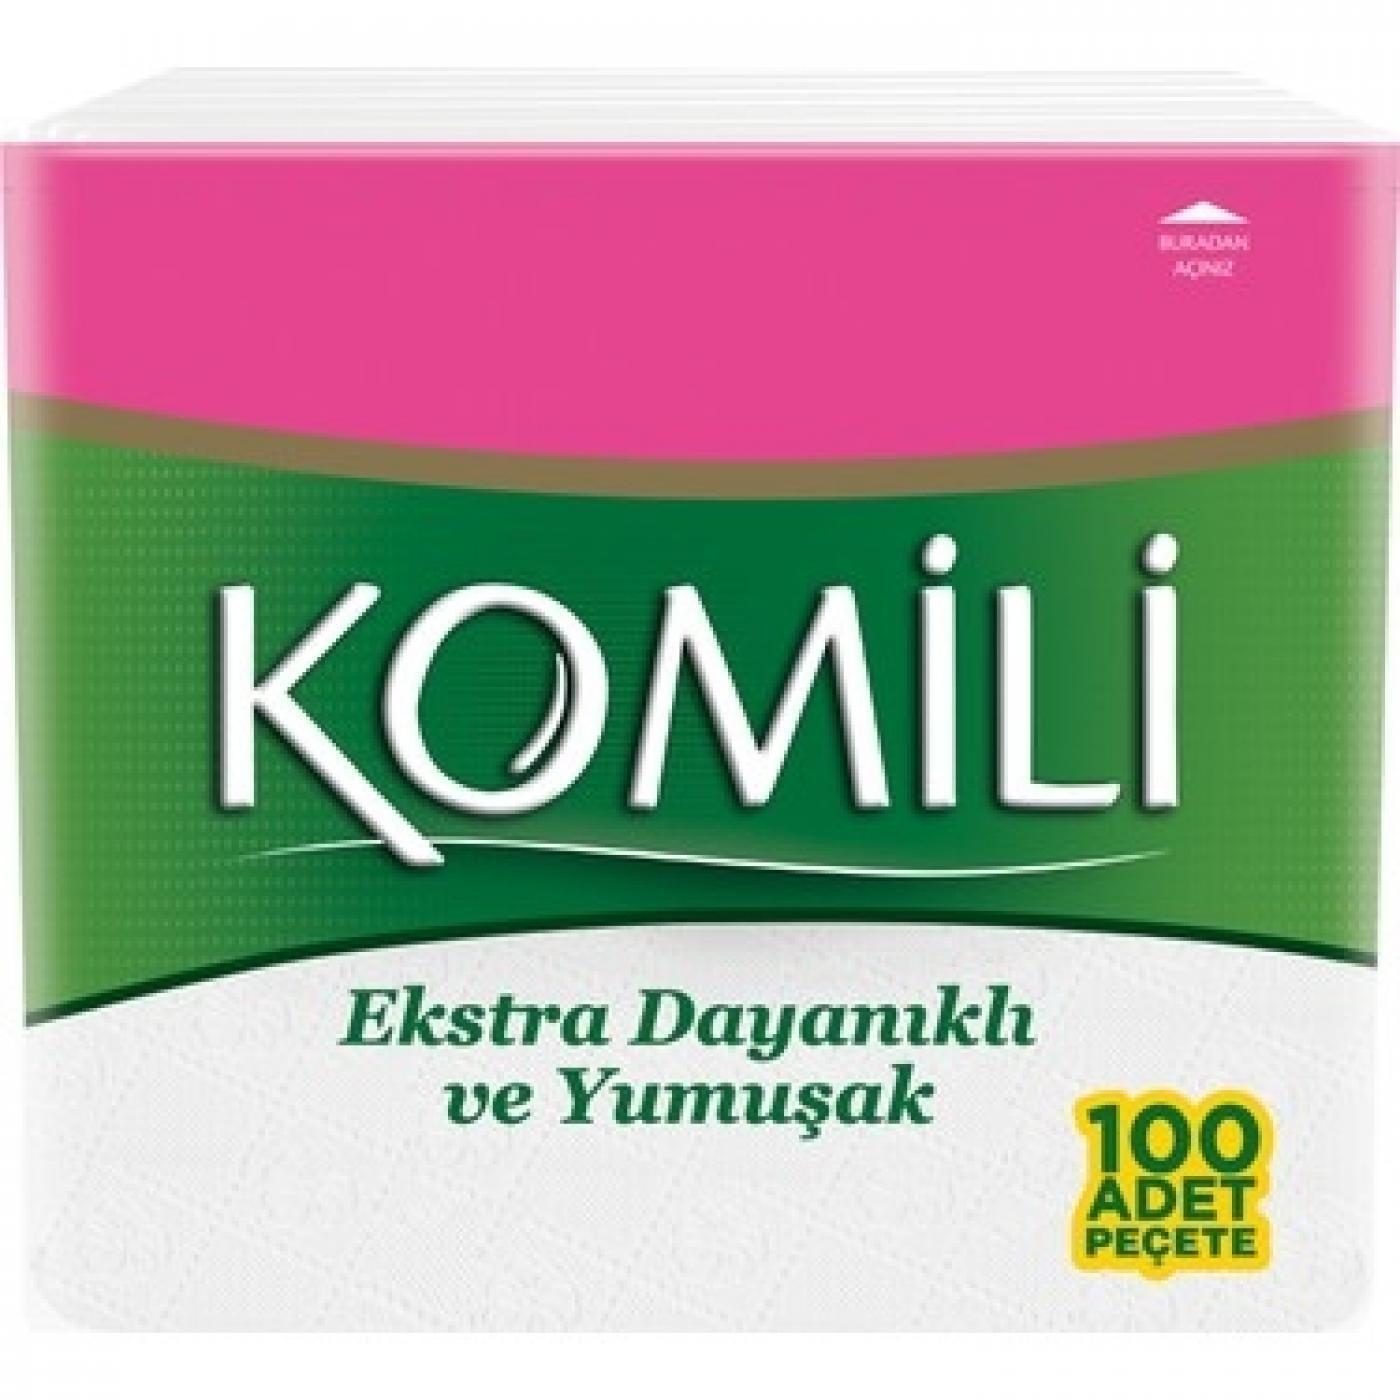 KOMİLİ PEÇETE 100LÜ